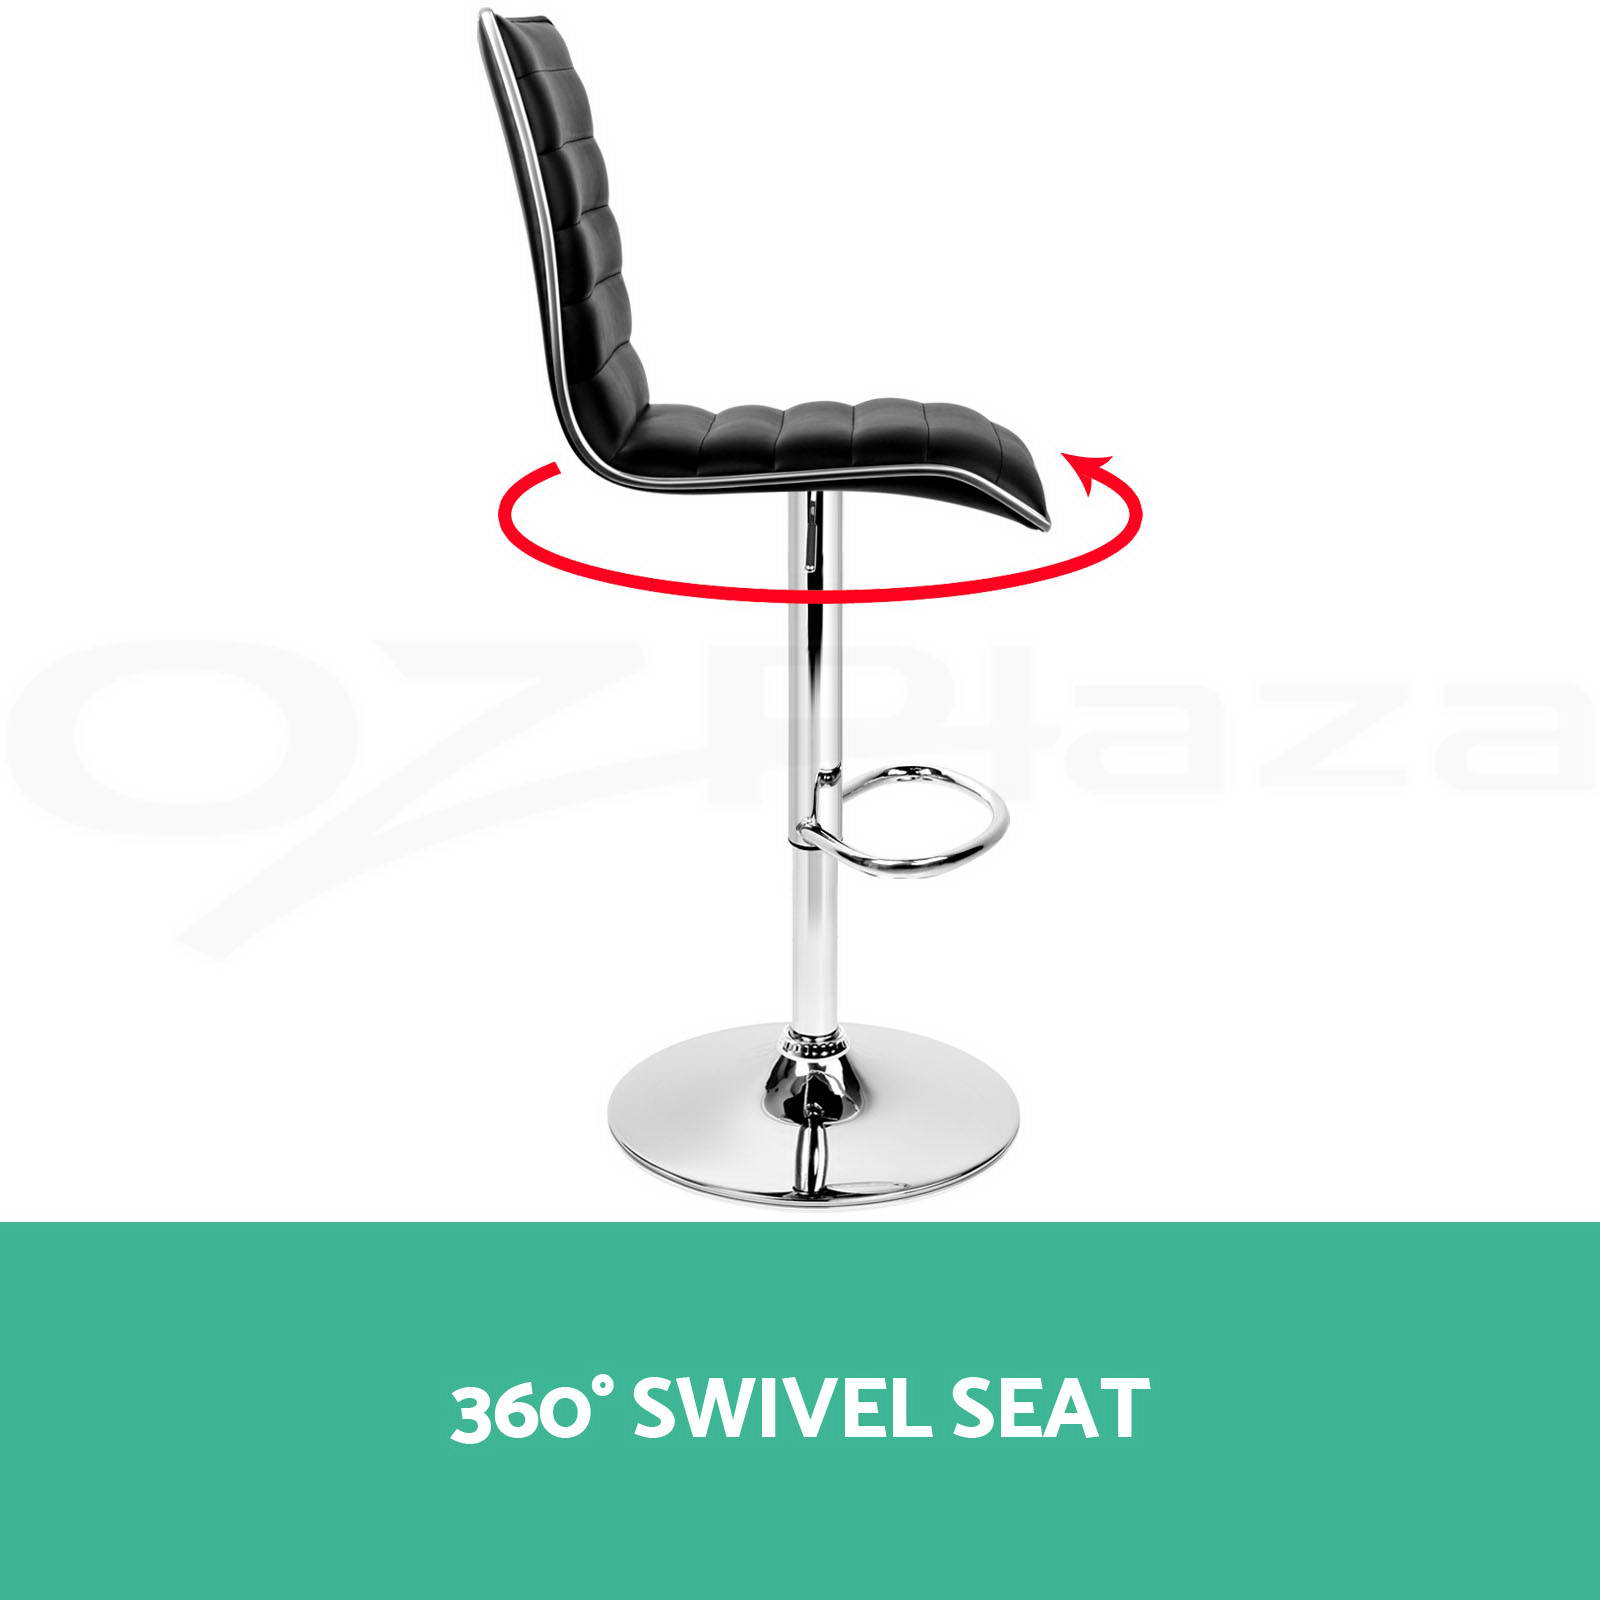 2x 4x Bar Stools Fabric PU Leather Dining Chair Barstool  : BA TW 1126 BKX2 VARN P06 from www.ebay.com.au size 1600 x 1600 jpeg 72kB